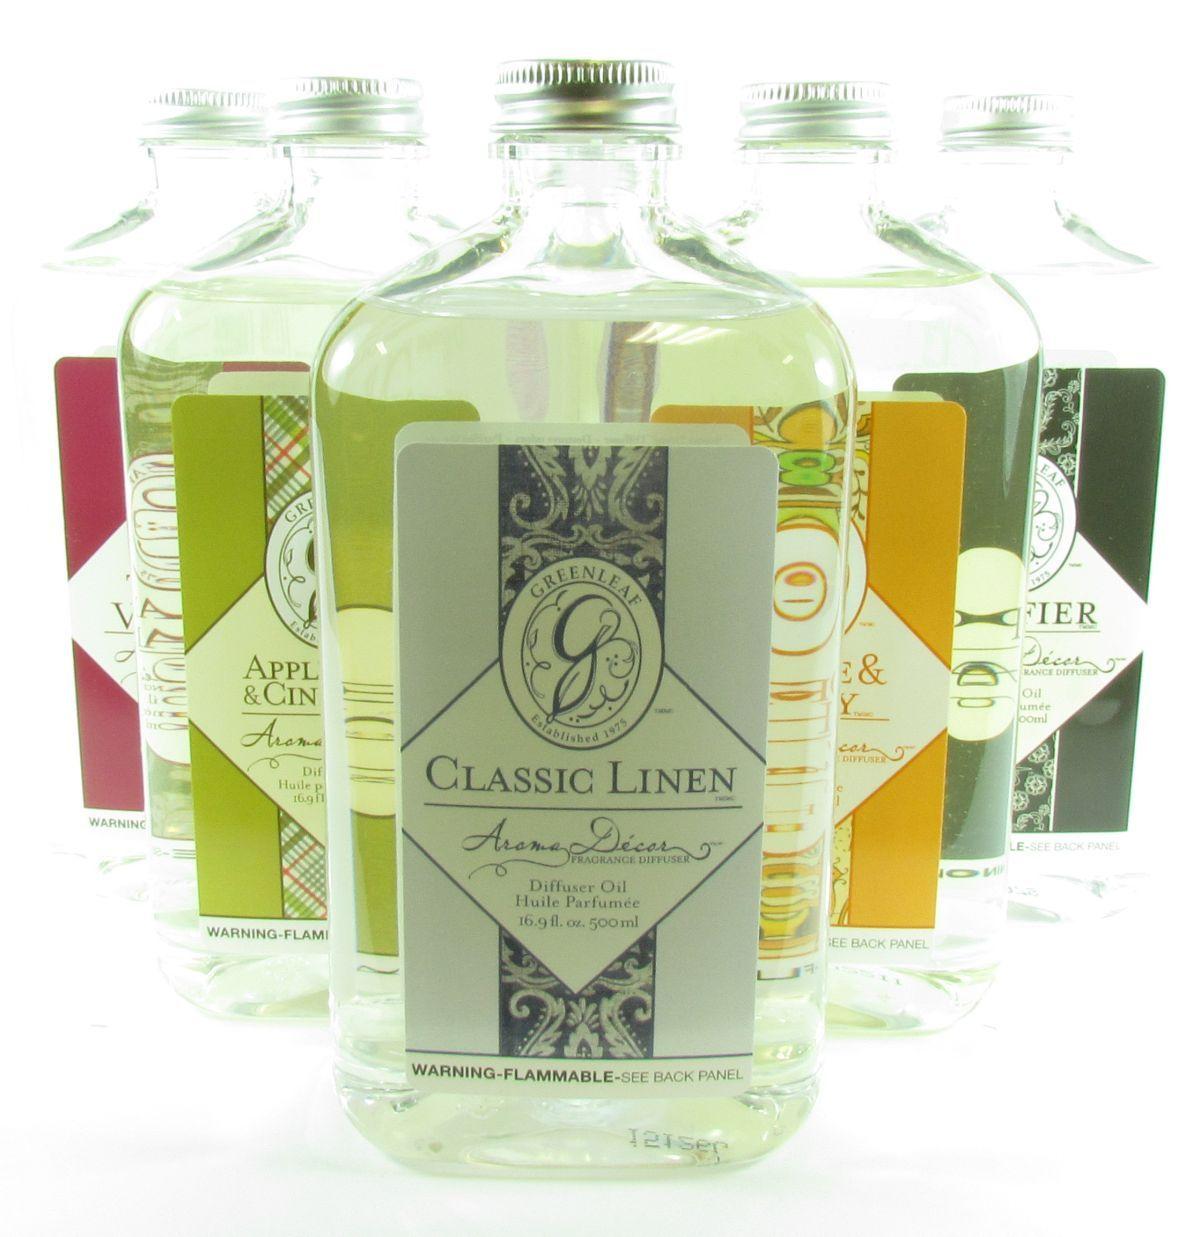 Green Leaf Naturals Organic Aloe Vera Gel Spray For Skin Hair